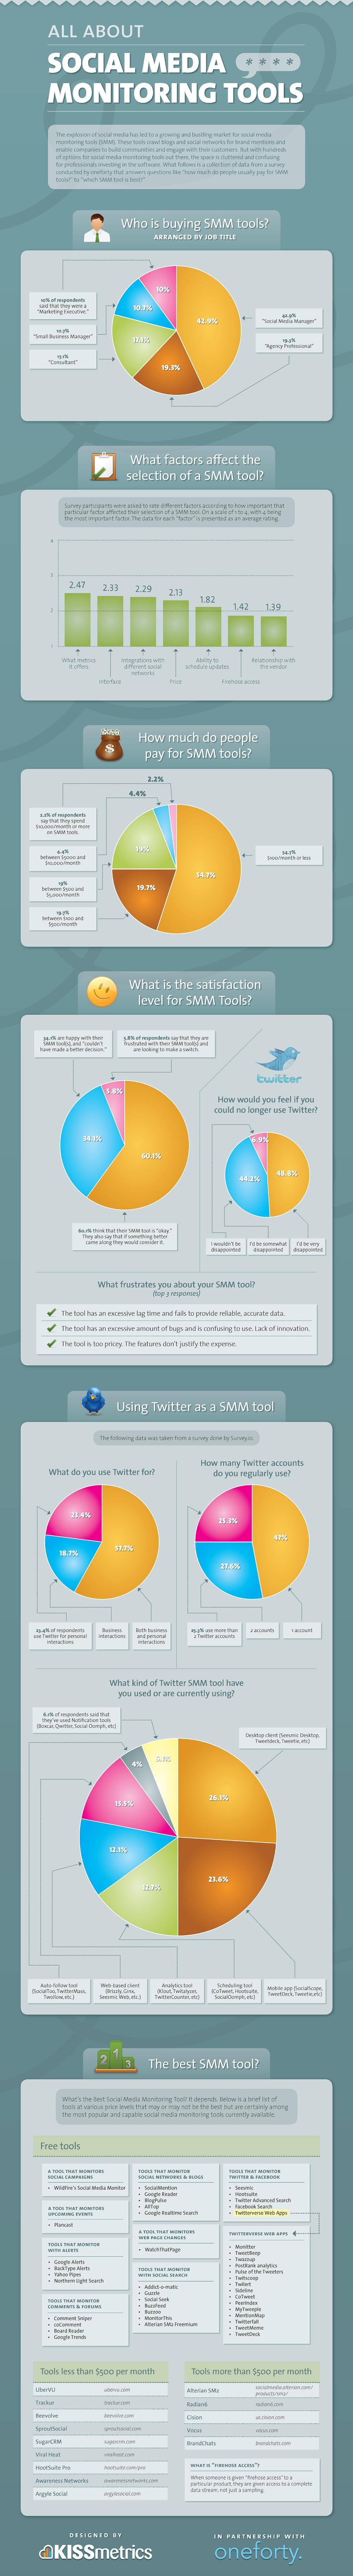 Social Media Monitoring: Was ist wirklich wichtig?